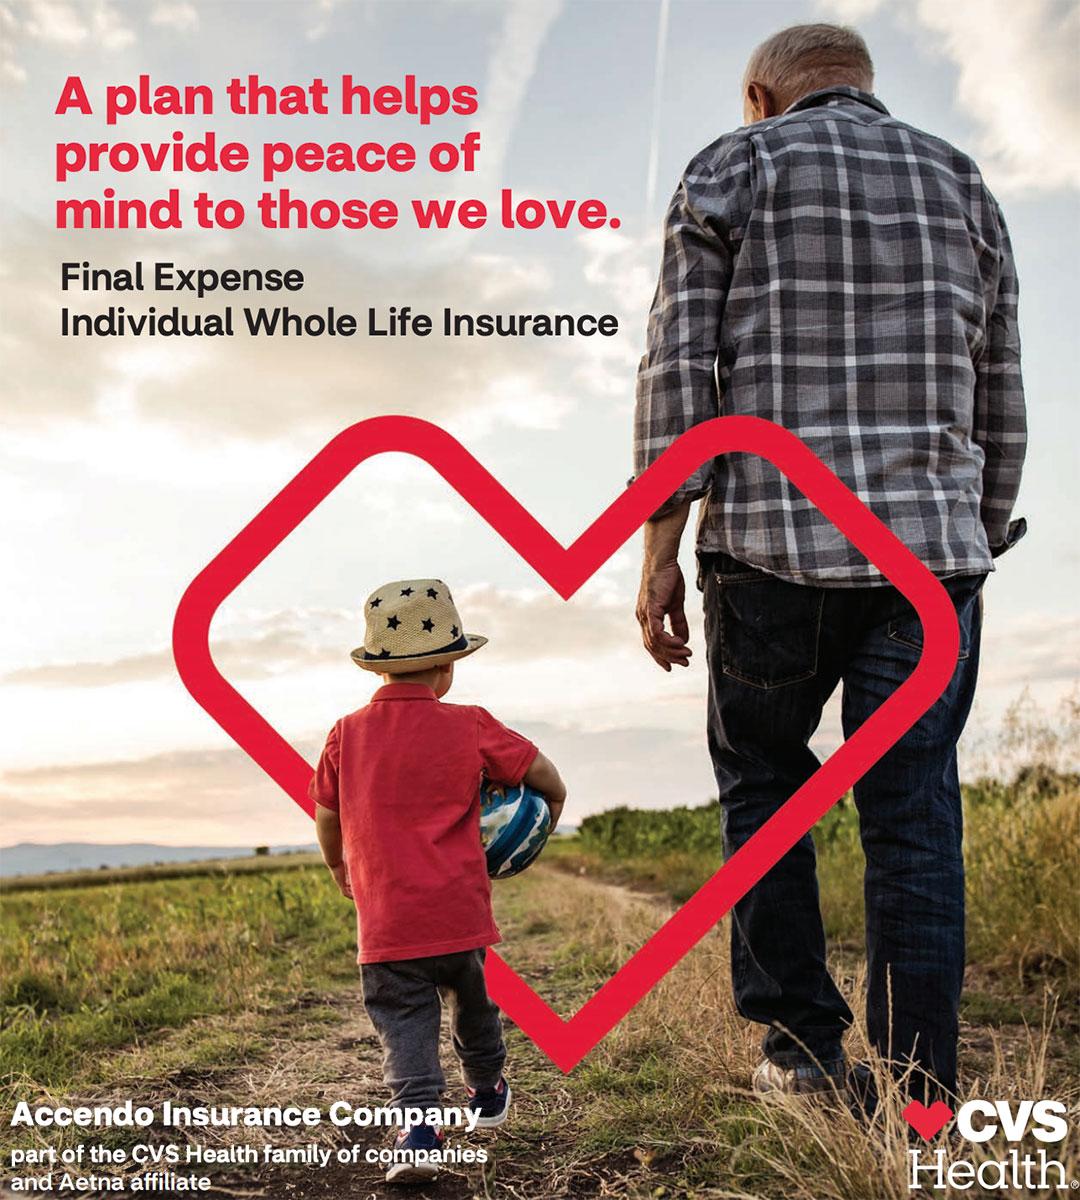 CVS Health Final Expense Whole Life Insurance